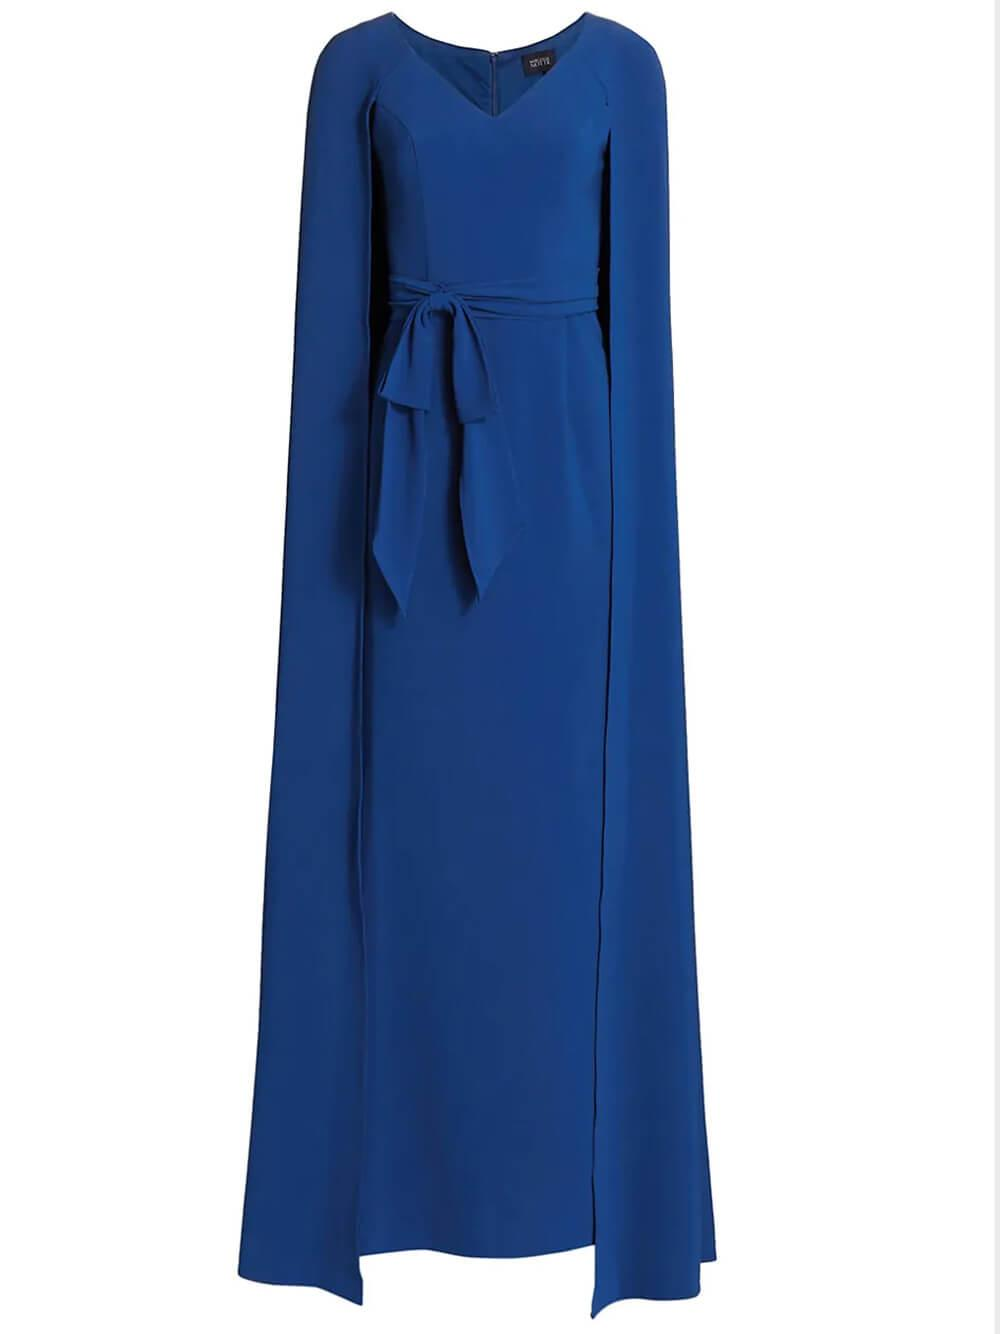 Cape Effect Gown Item # N48M2706